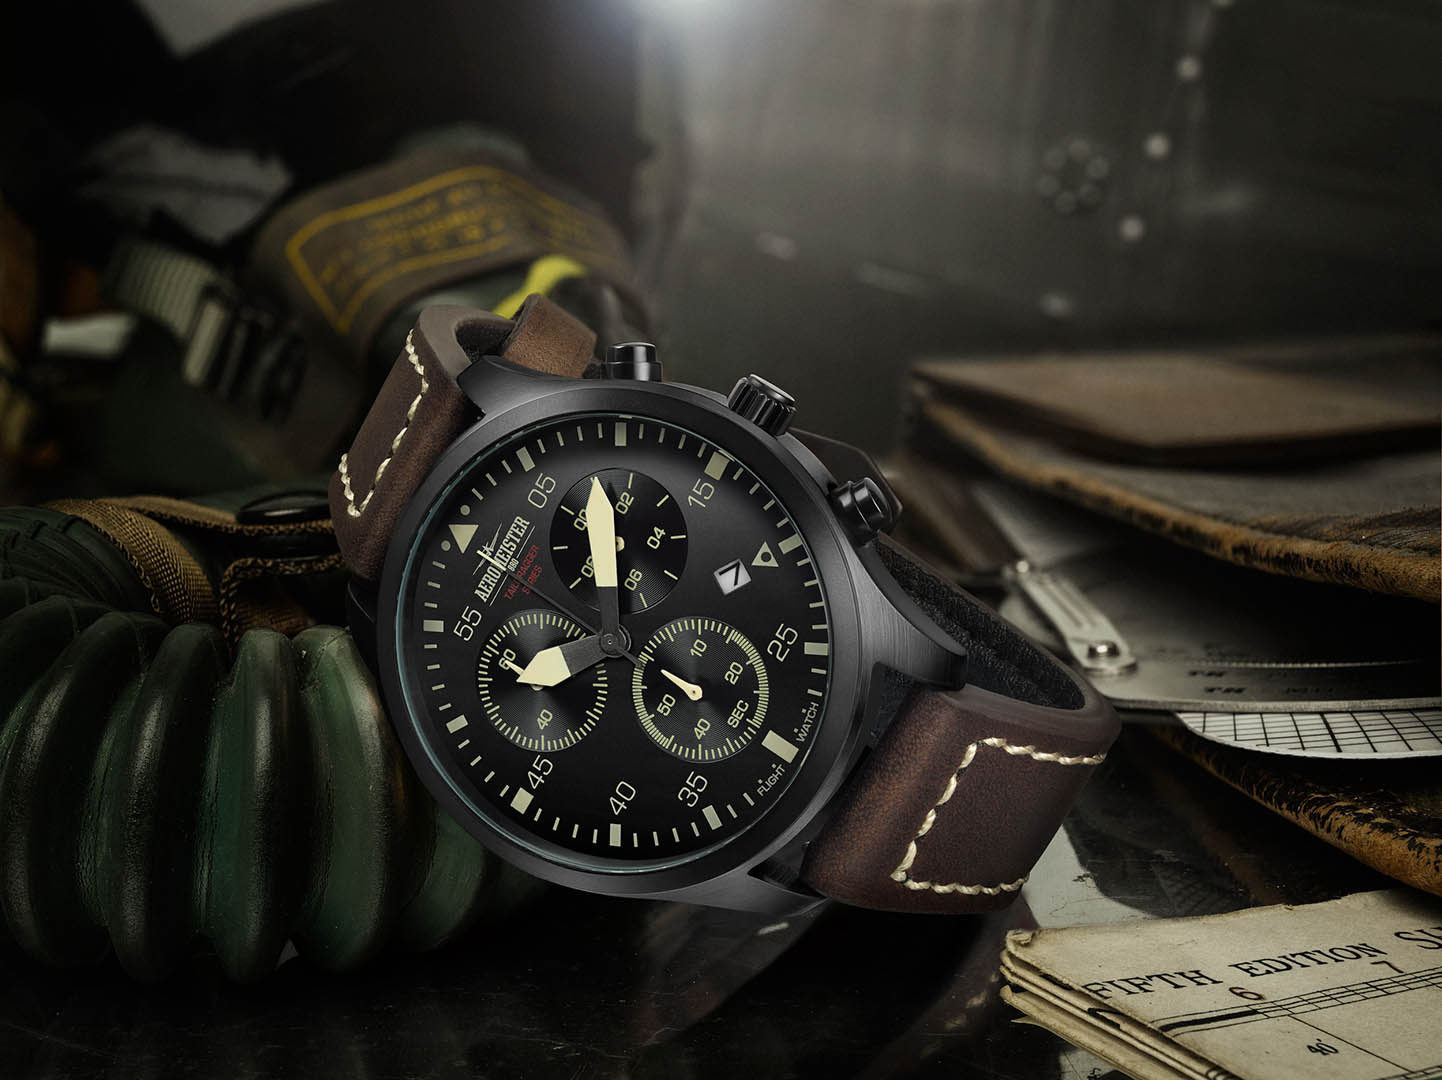 aeromeister aviation watch still-life photography